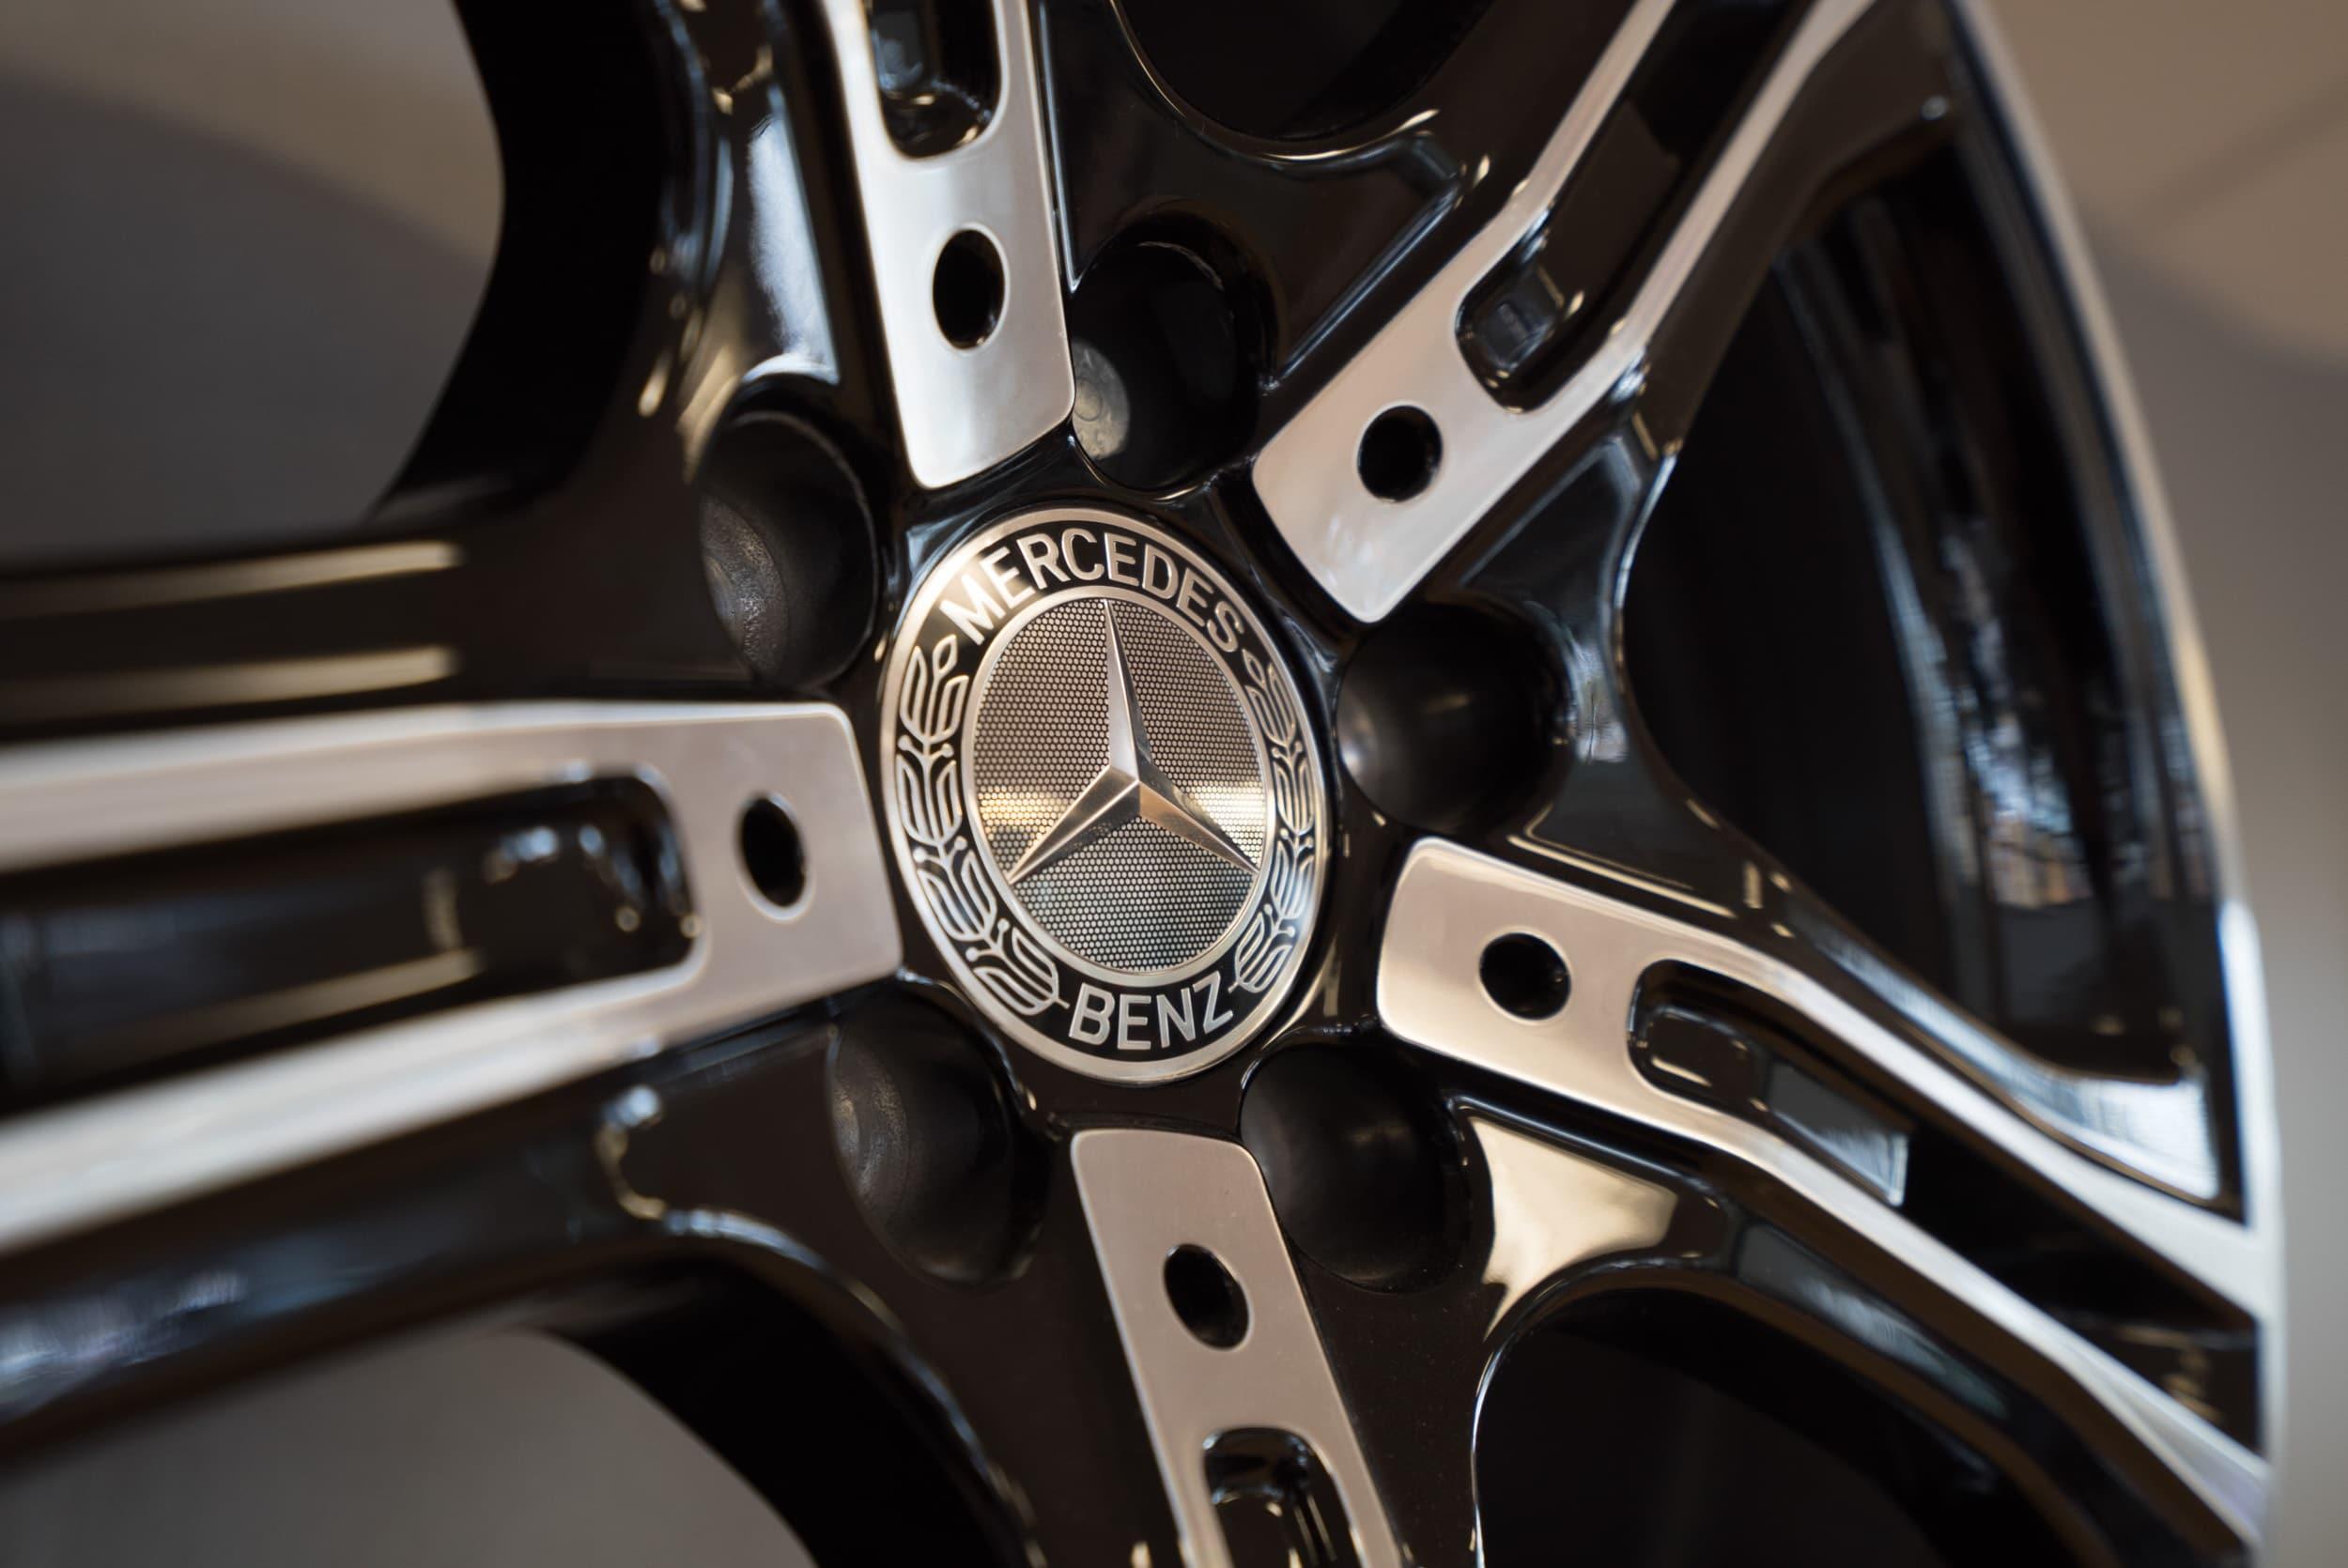 Mercedes benz dealer near me sarasota fl mercedes benz for B service mercedes benz